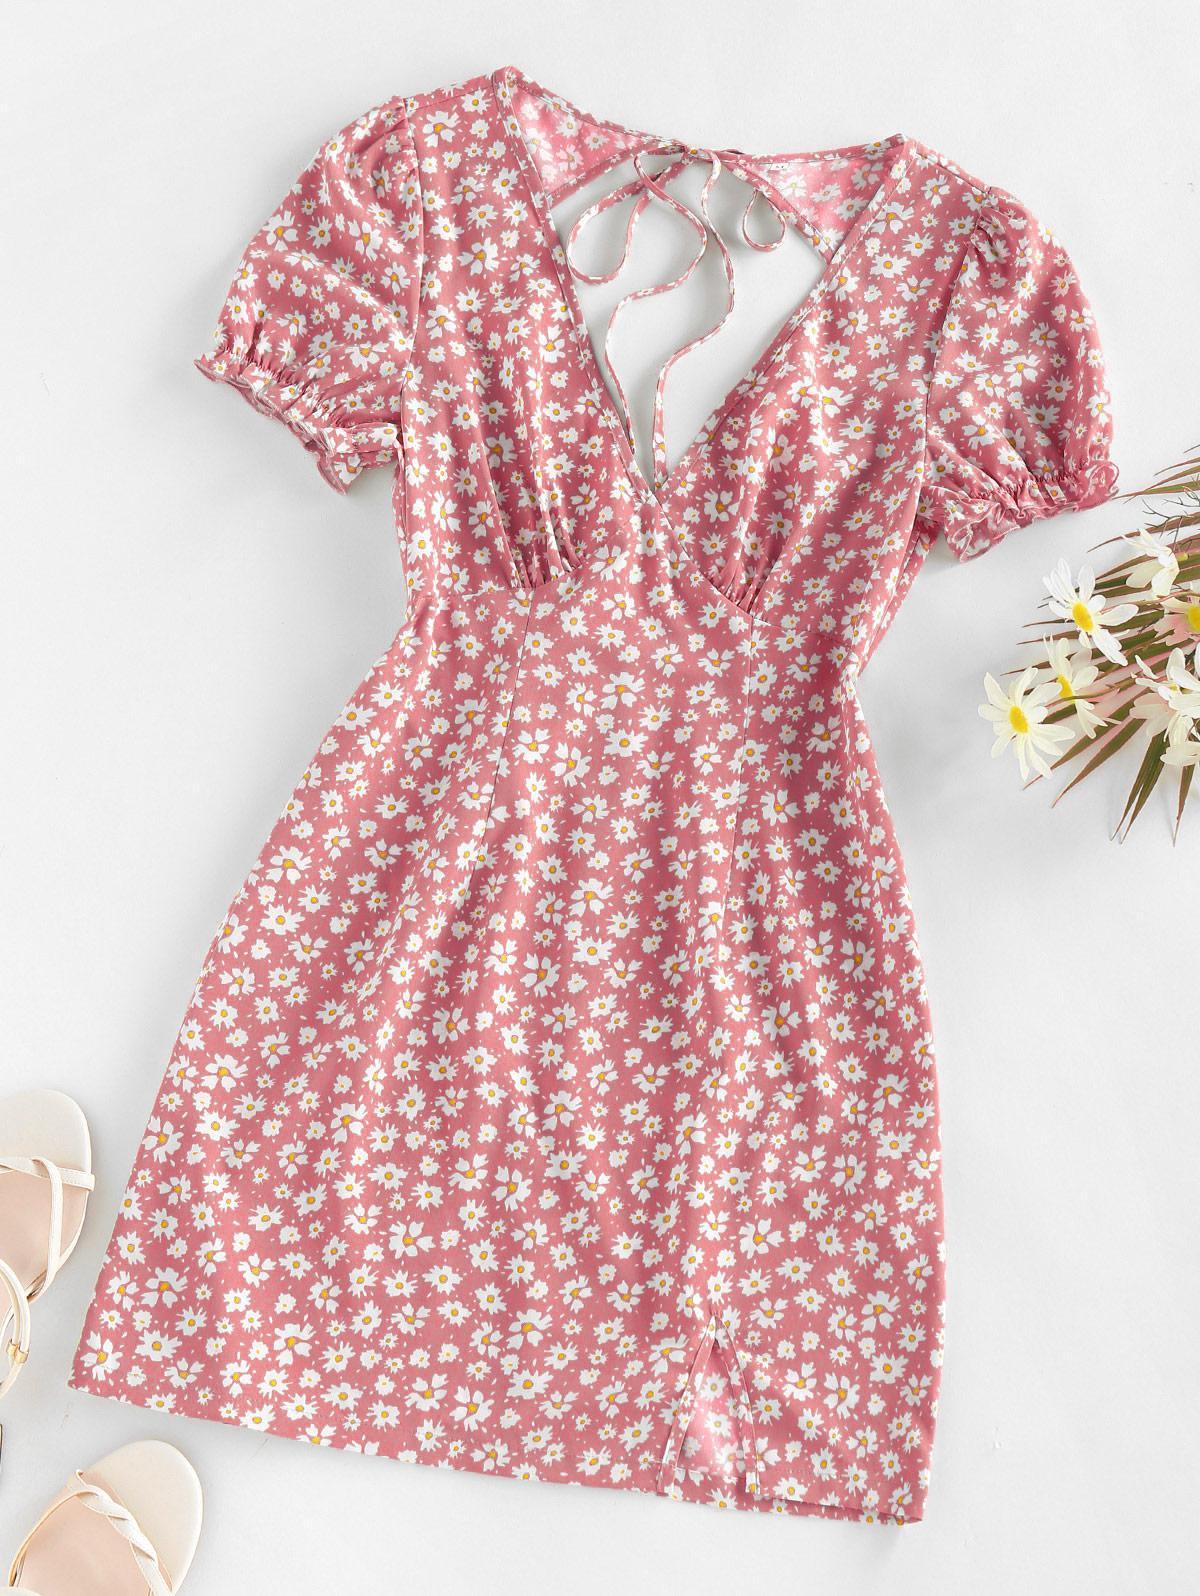 ZAFUL Daisy Floral Cutout Tie Slit Dress